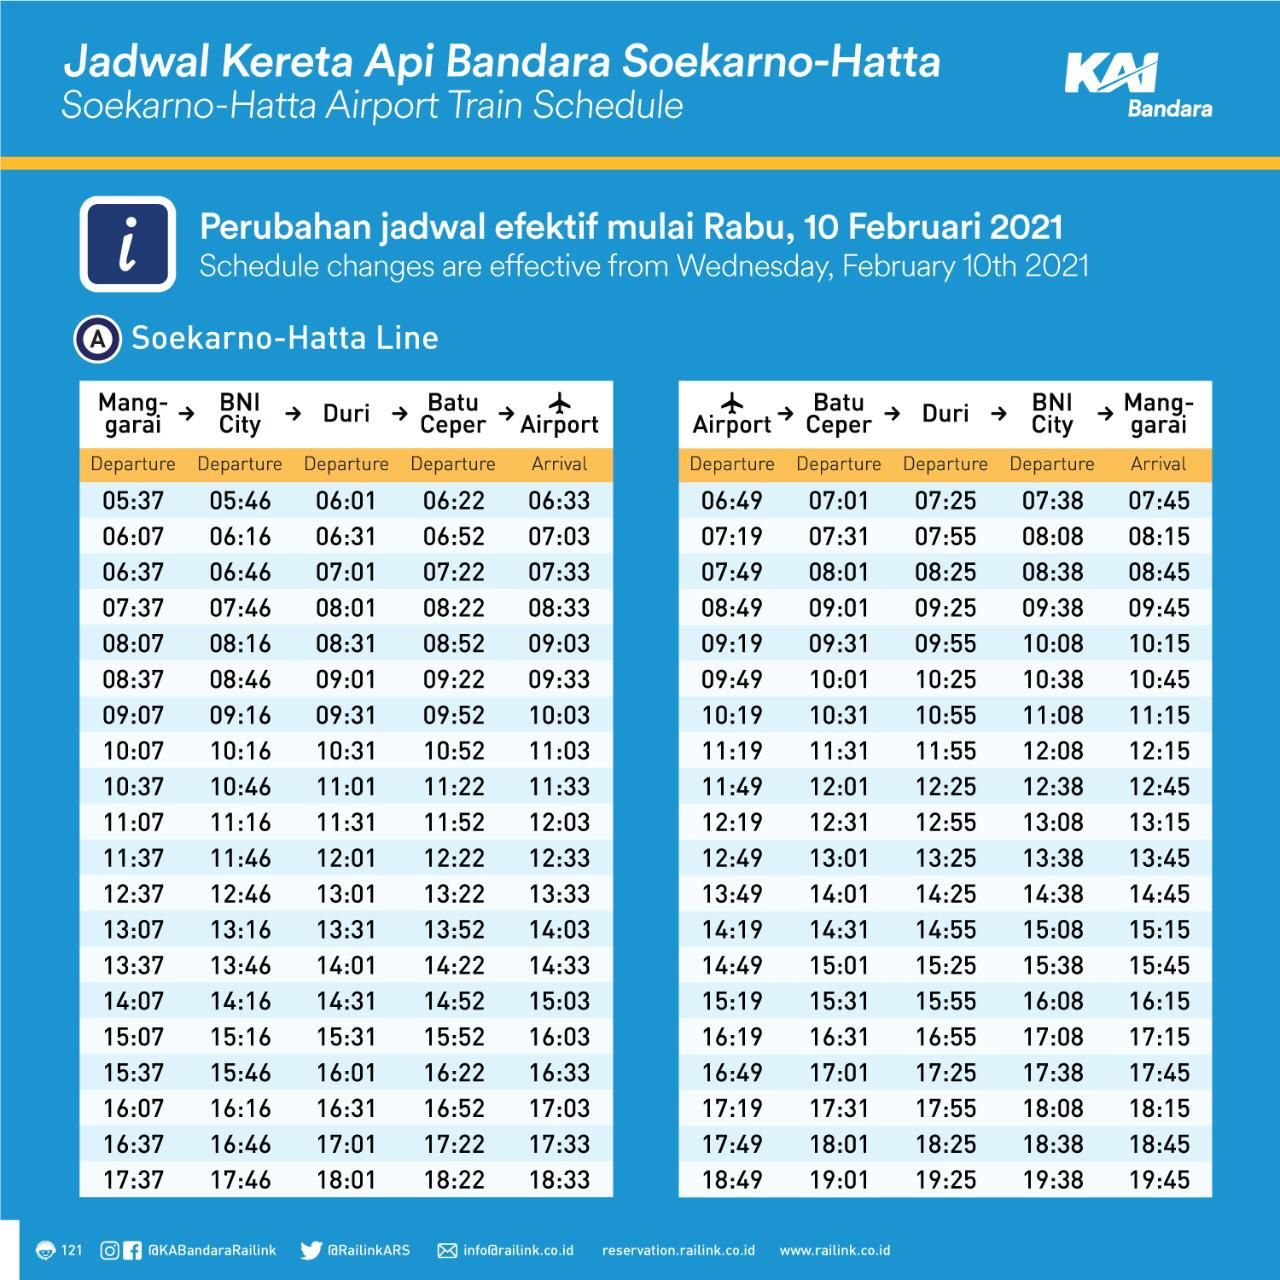 Jadwal kereta Bandara